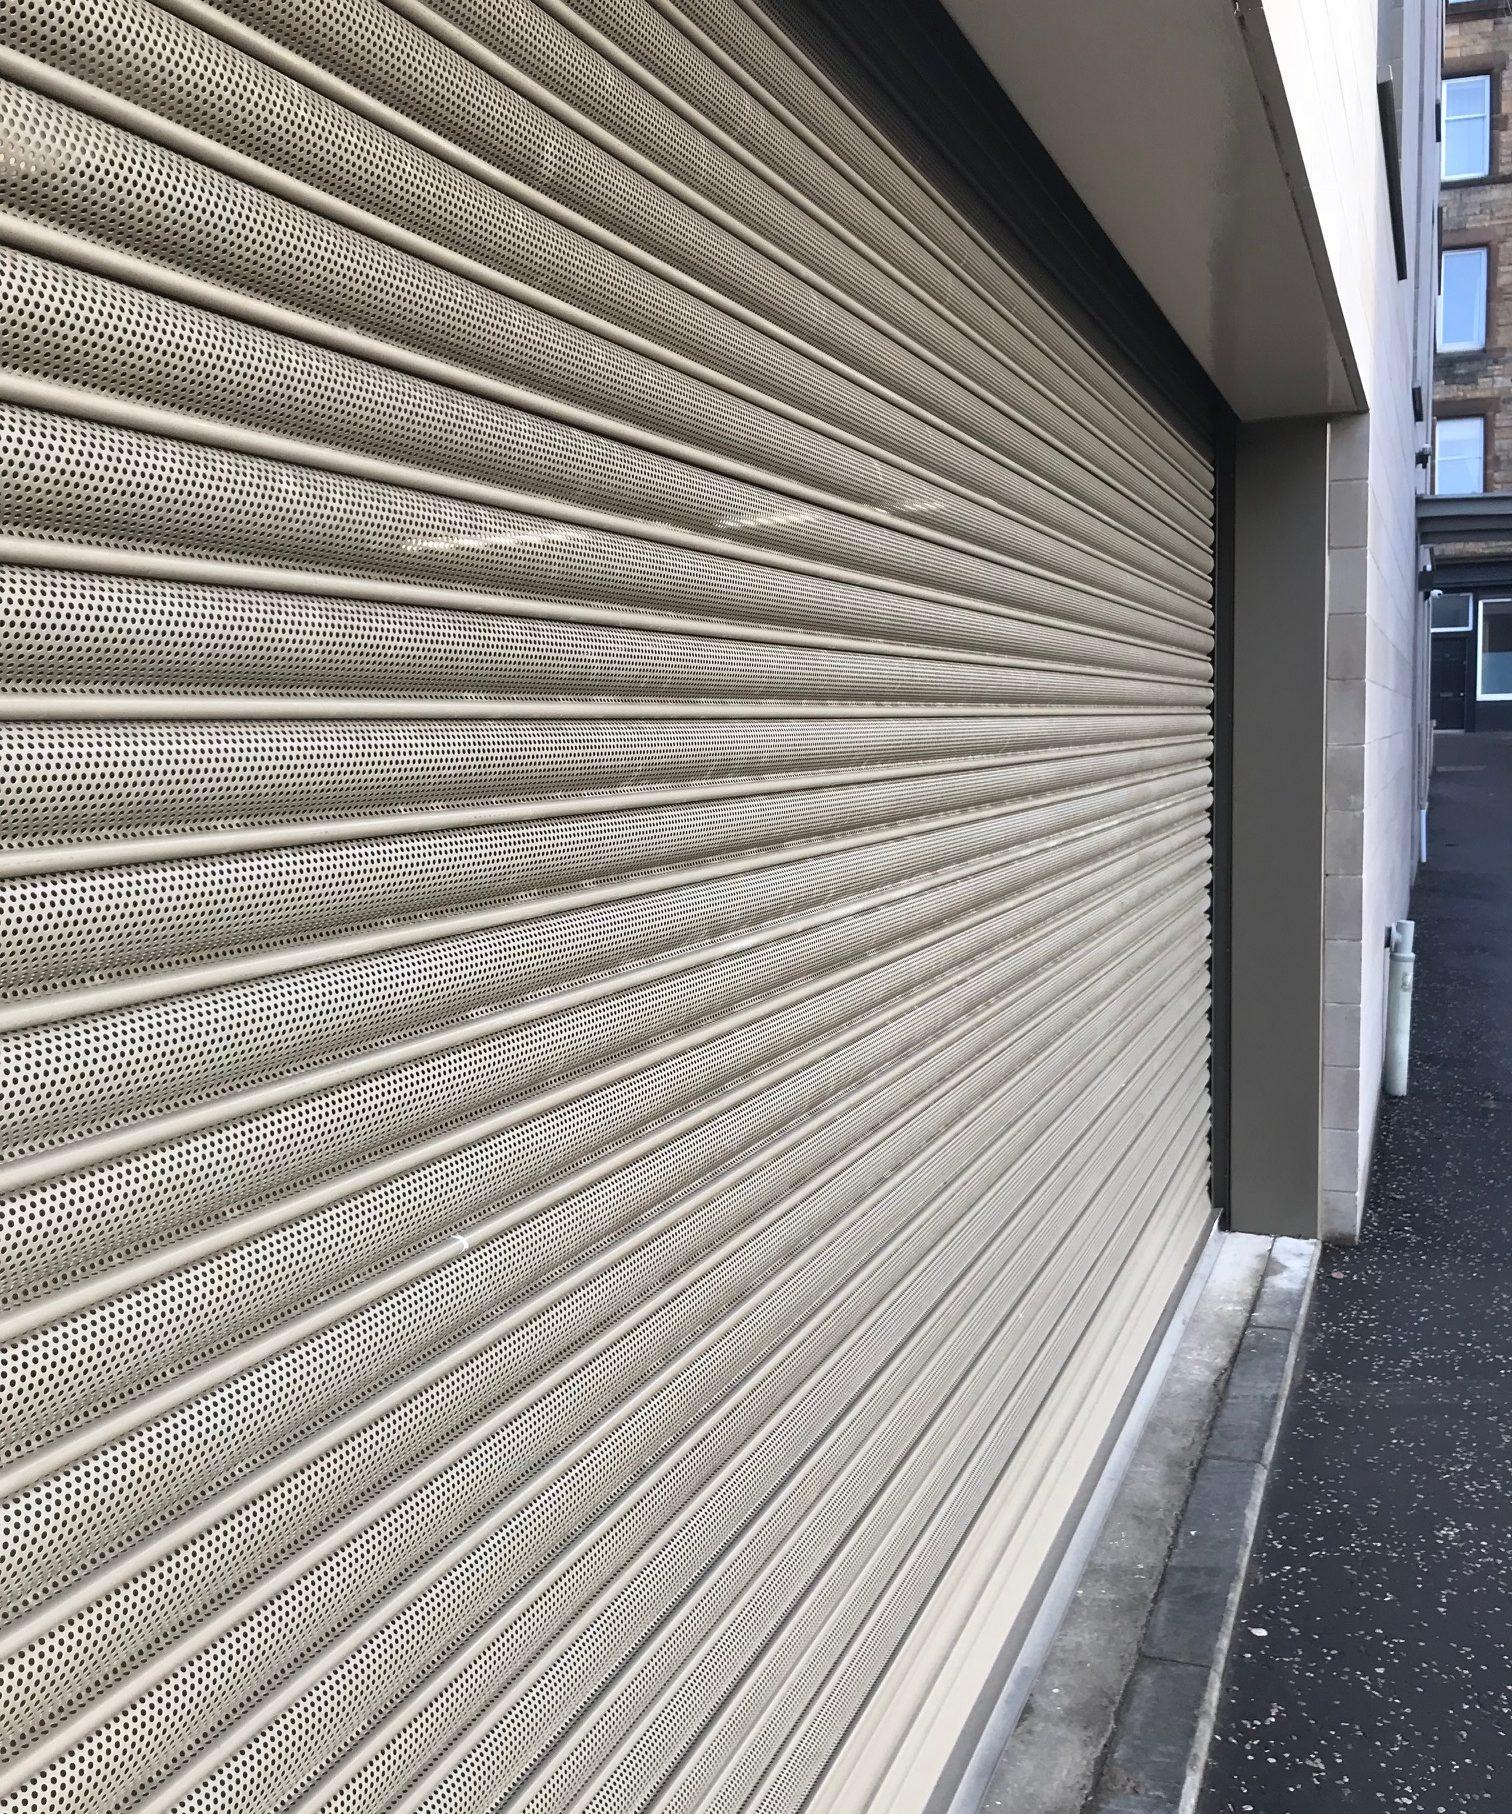 Perforated Roller Shutter Door for an underground Car Park in Edinburgh